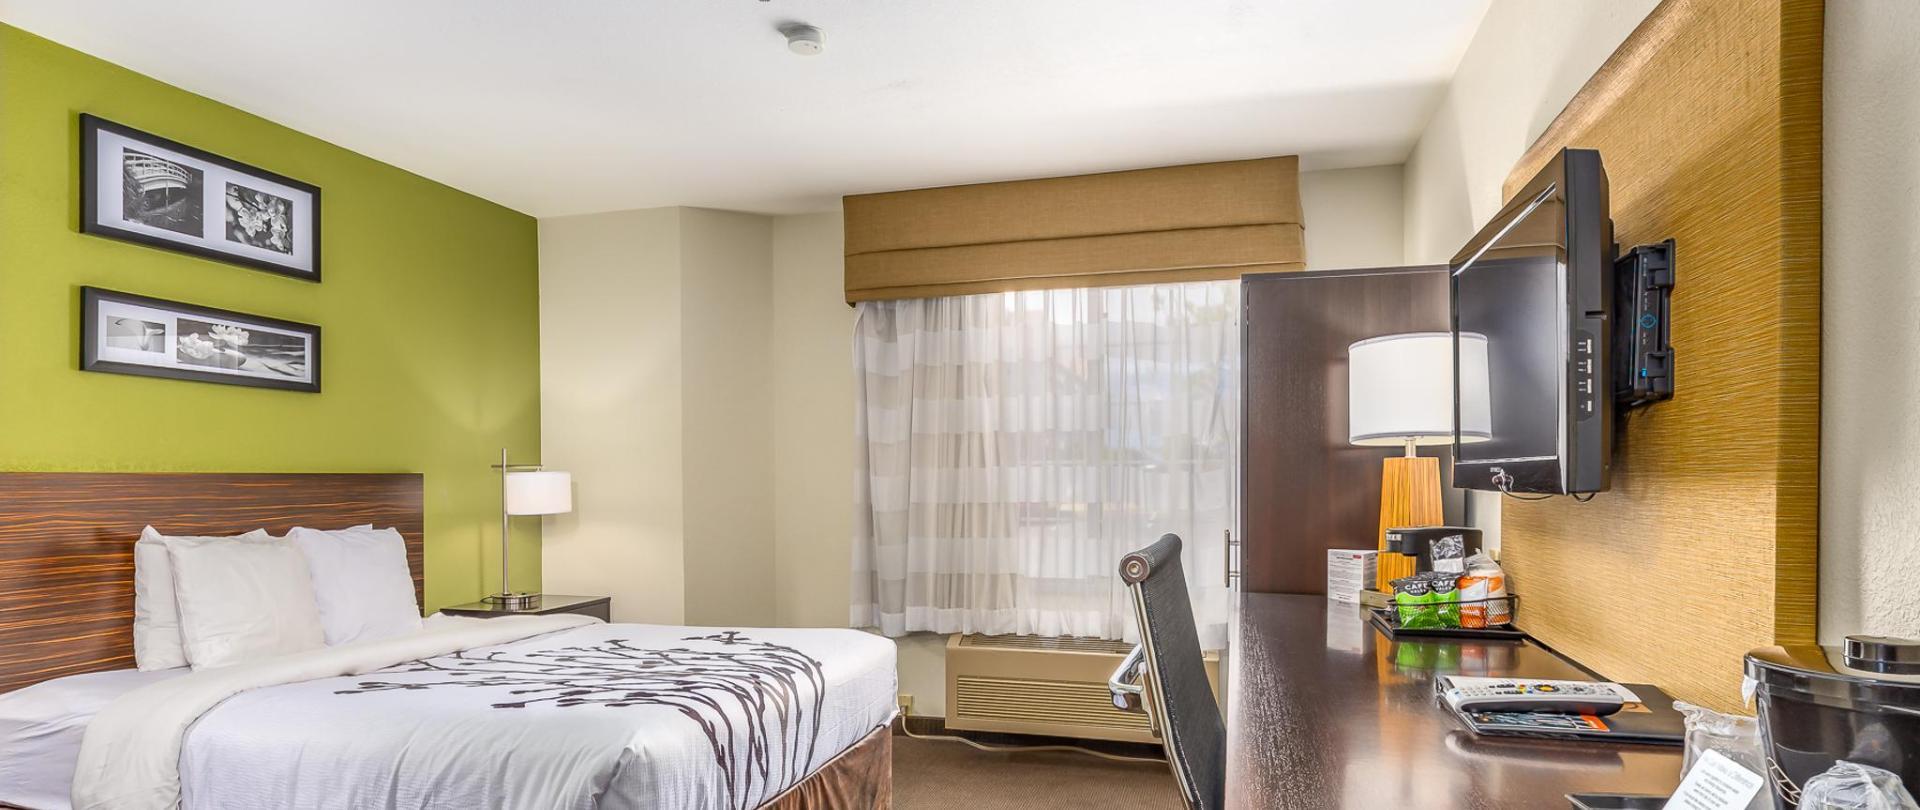 Room 102-5.jpg